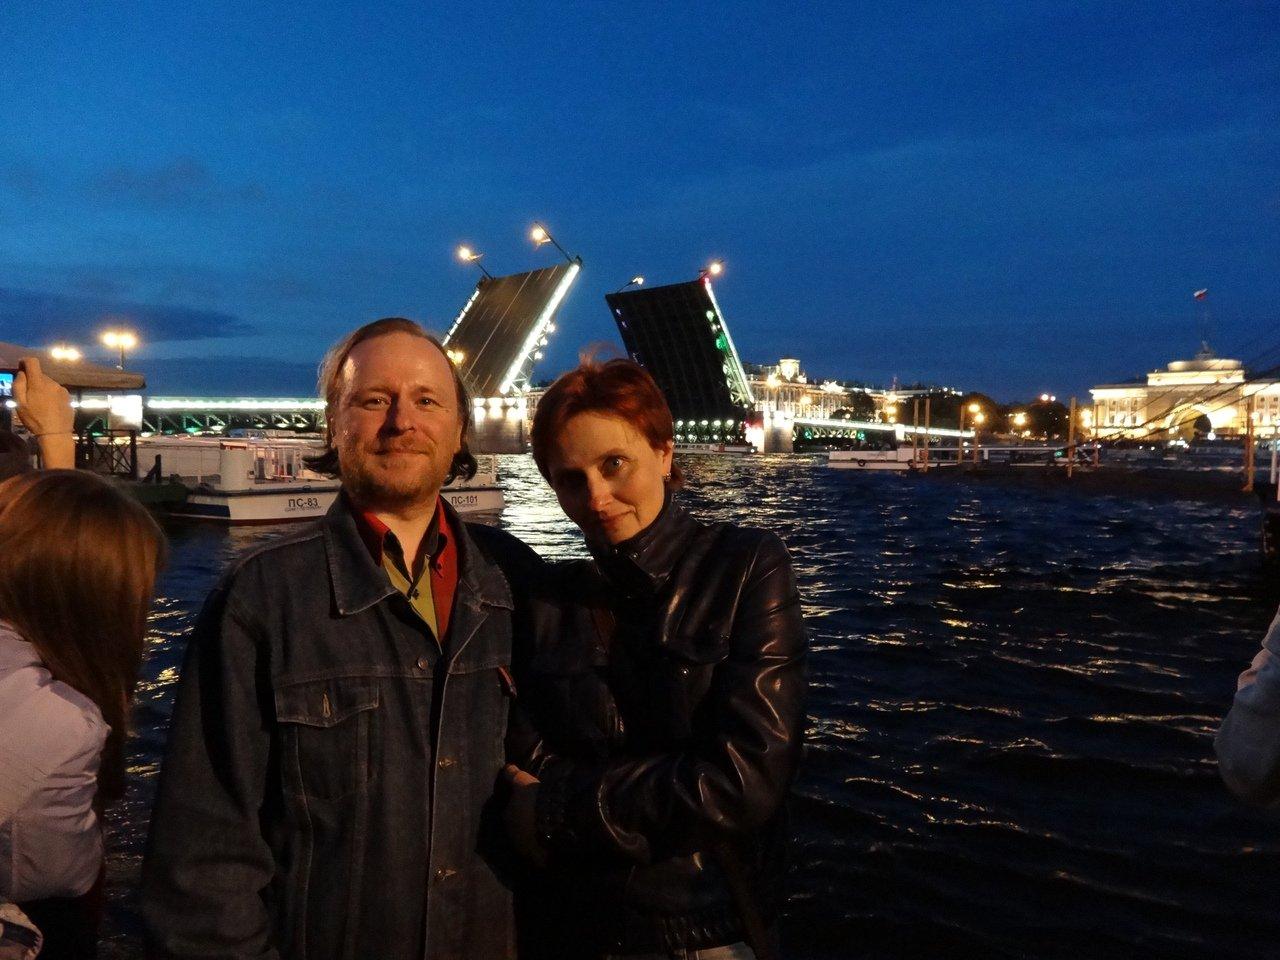 Санкт-Петербург, 2012 год